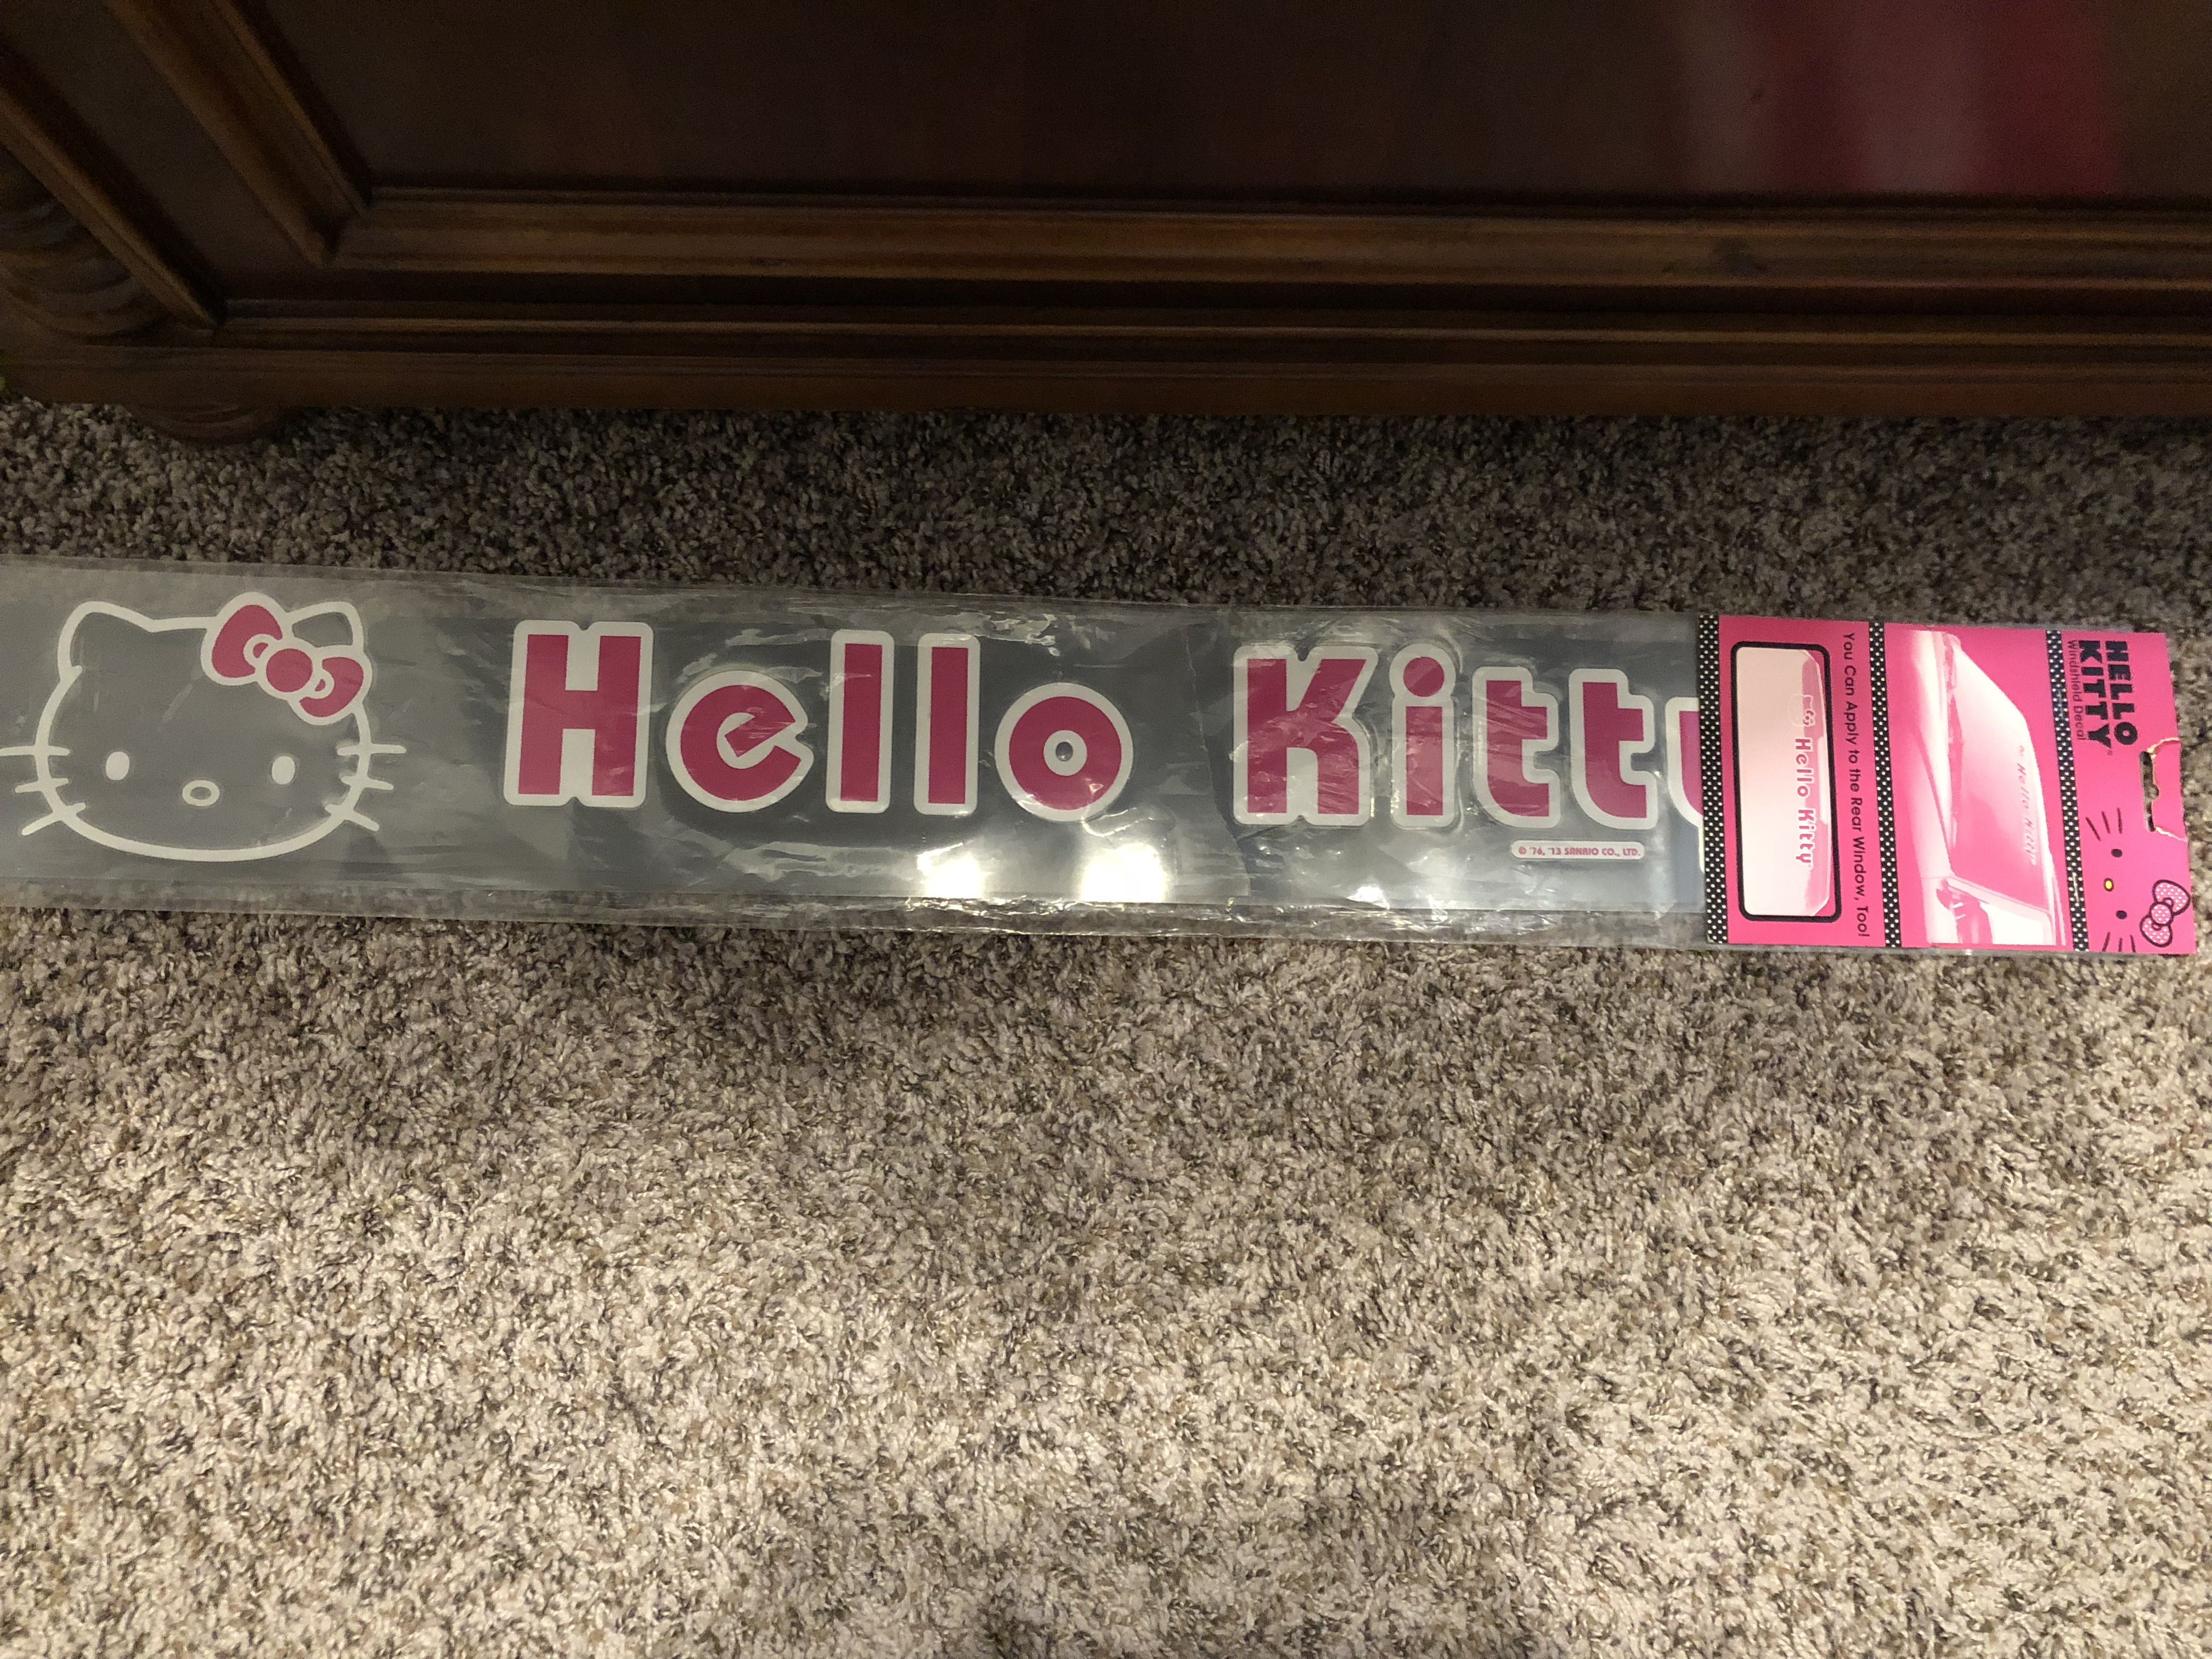 Hello Kitty Car Windshield Decal Hello Kitty Car Hello Kitty Car Accessories Hello Kitty Accessories [ 3024 x 4032 Pixel ]